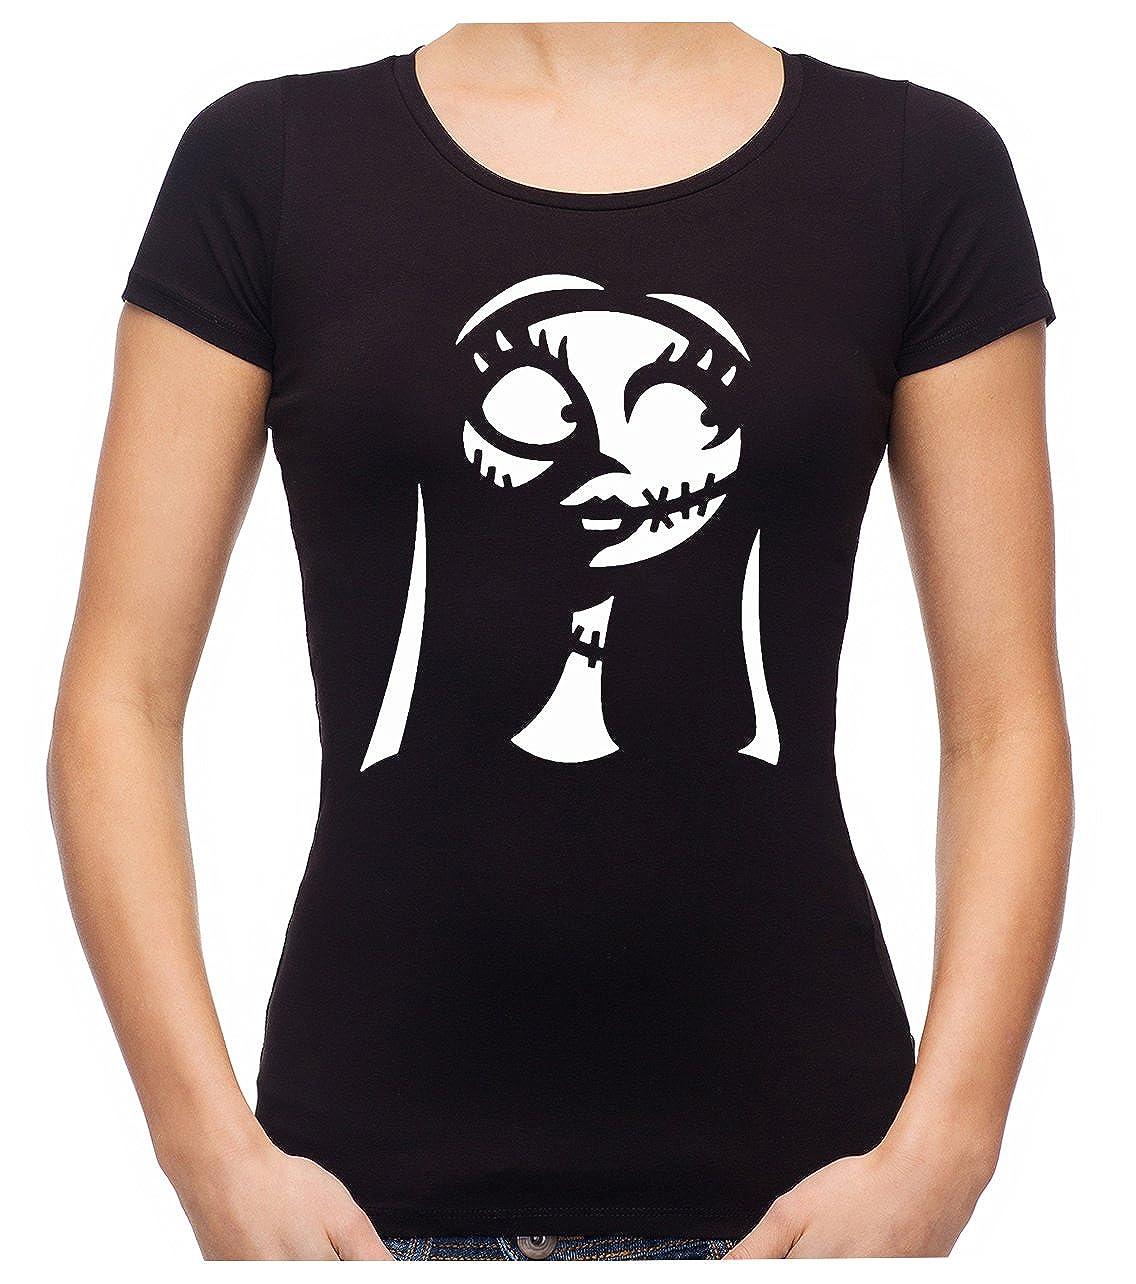 Sally Silhouette Nightmare Before Christmas Women\'s Babydoll Shirt ...